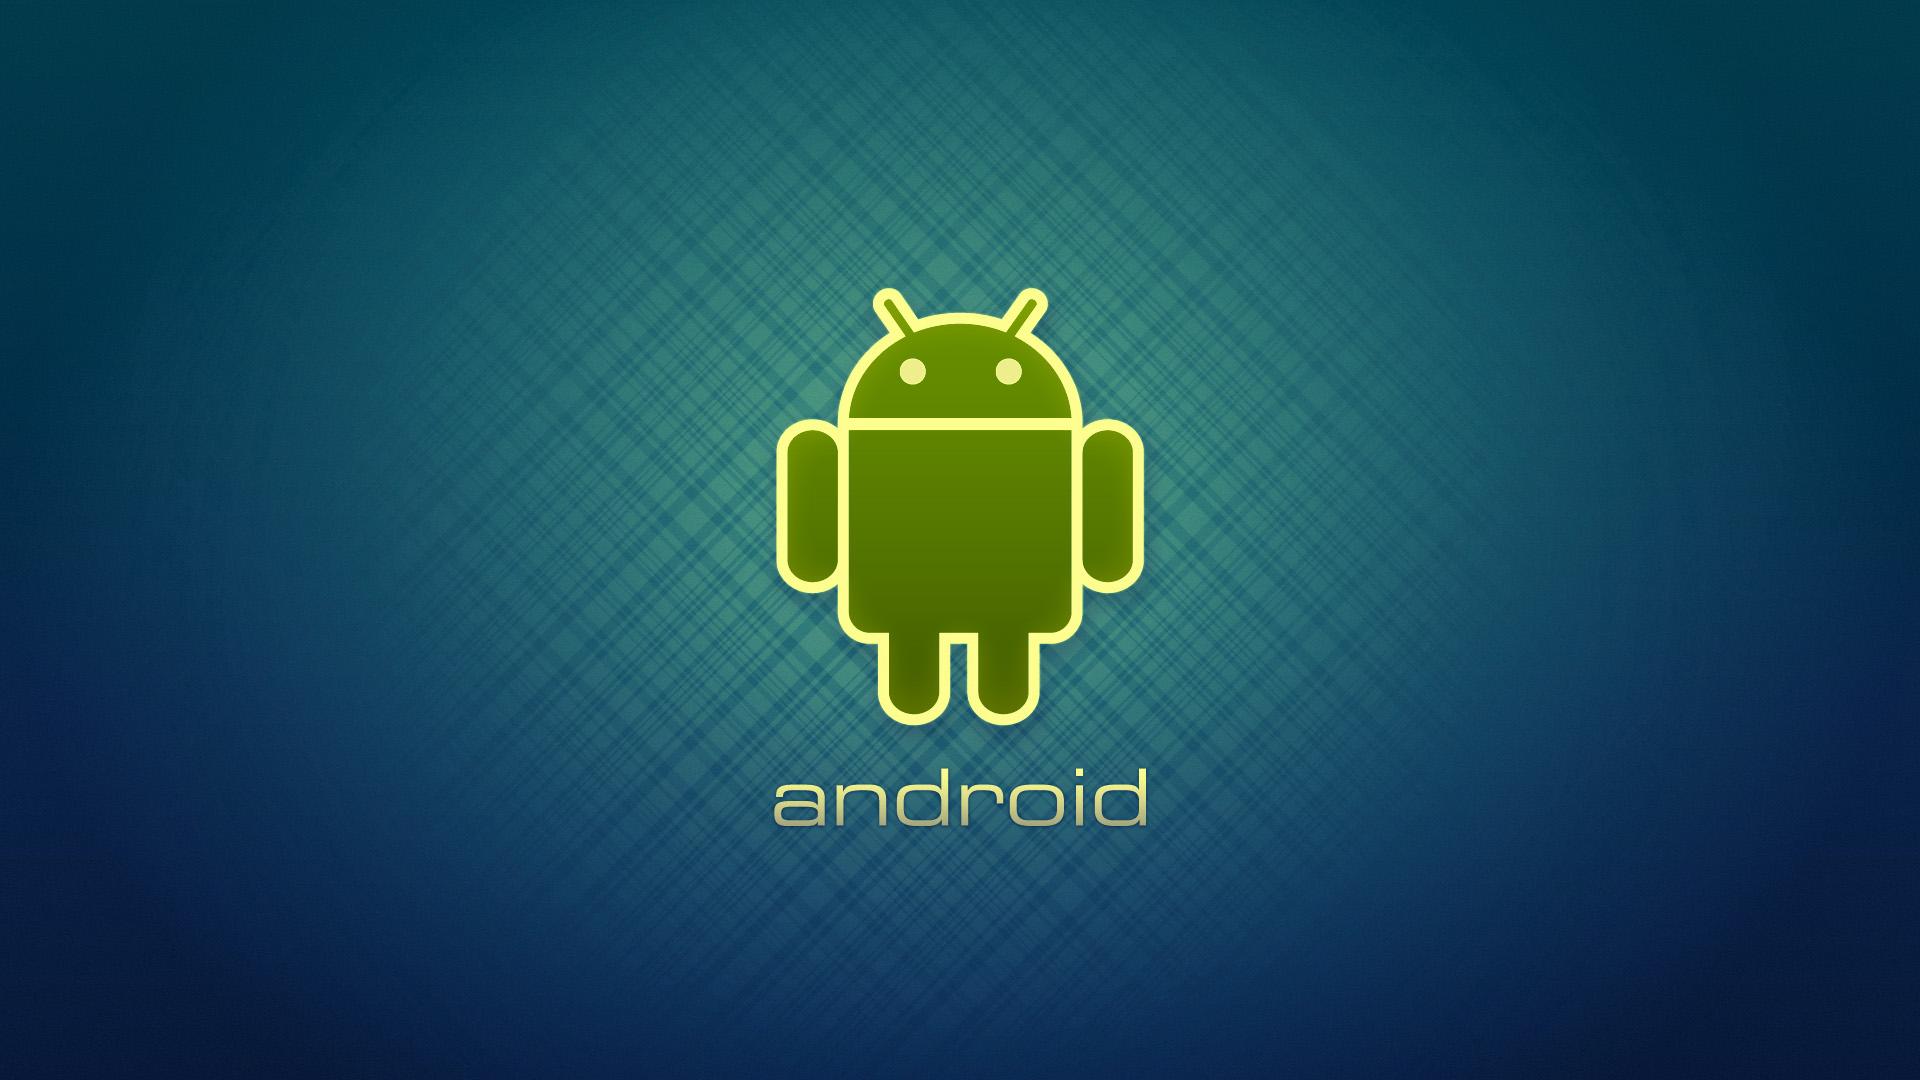 Programmi gratis per Android. Parte 2.